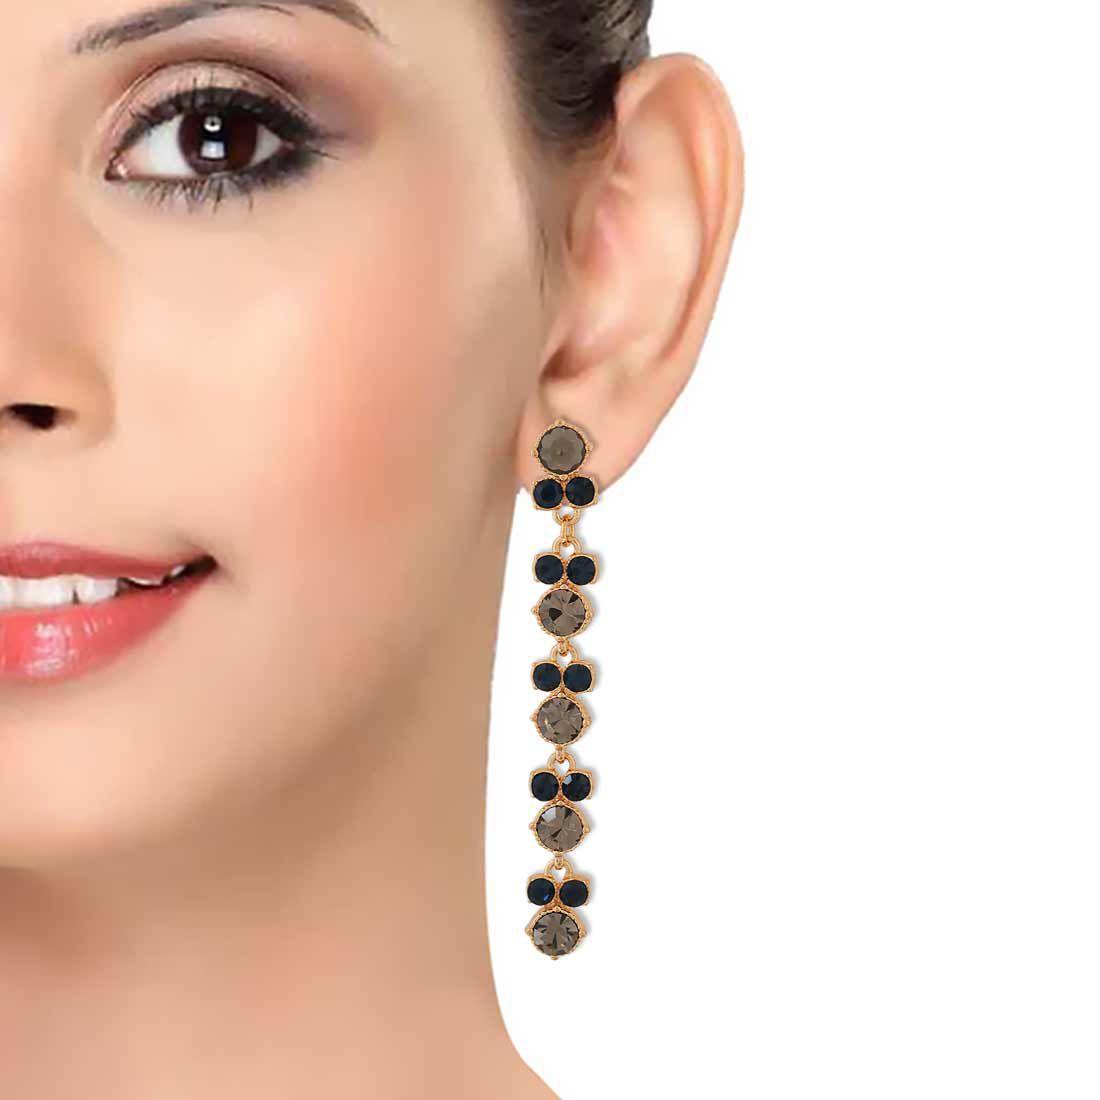 Maayra Classic Earrings Black Dangler Party Jewellery